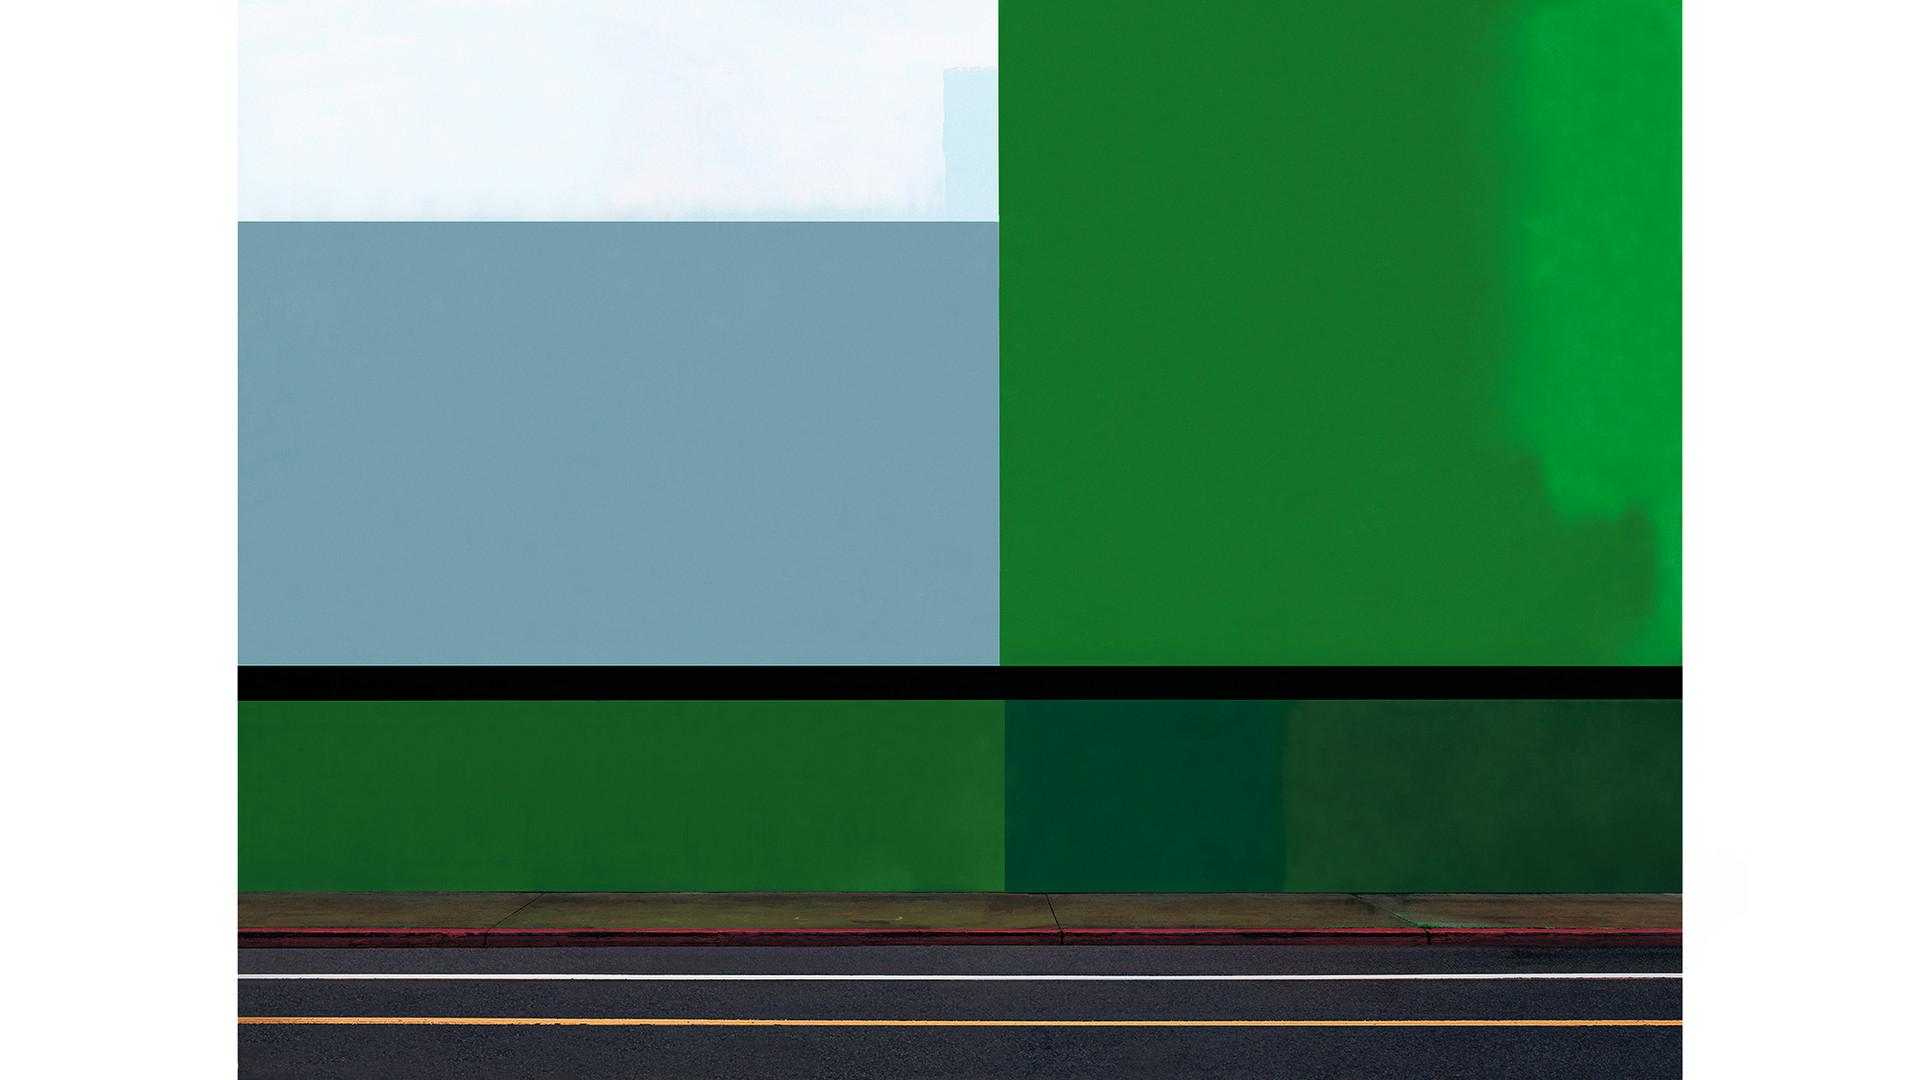 W 1st Street I, 2017 140 x 182 cm, archival pigment print, ed. of 7